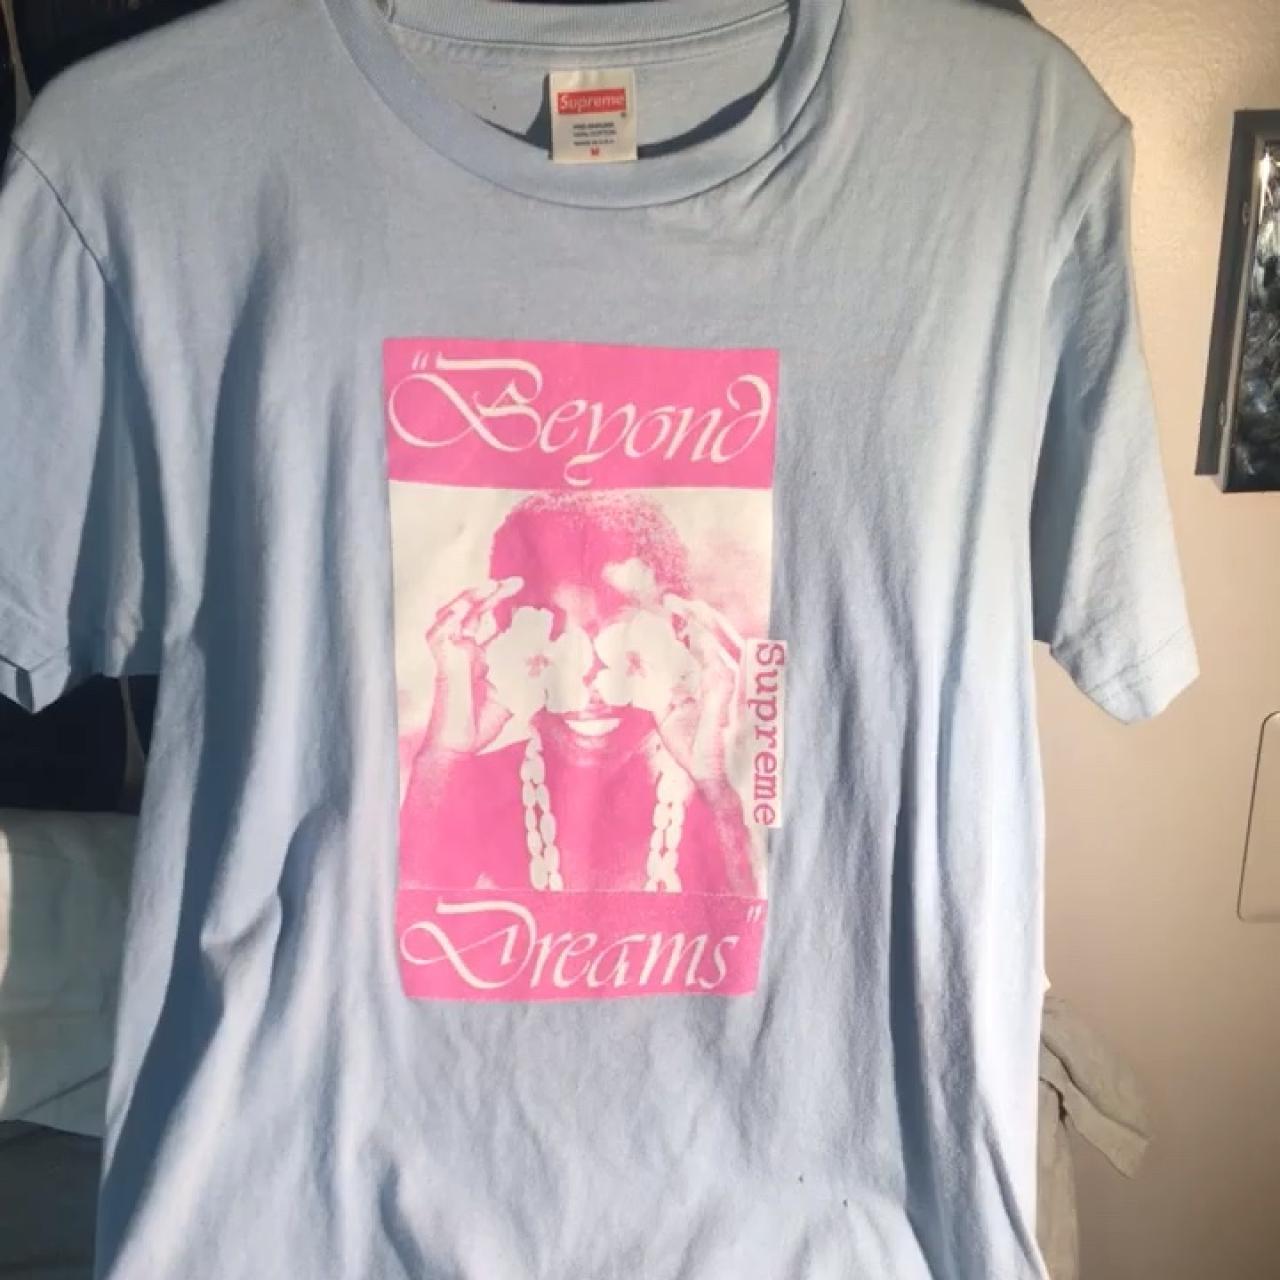 4ab3b8d7 SUPREME BEYOND DREAMS GUCCI MANE T-SHIRT This t-shirt is in - Depop